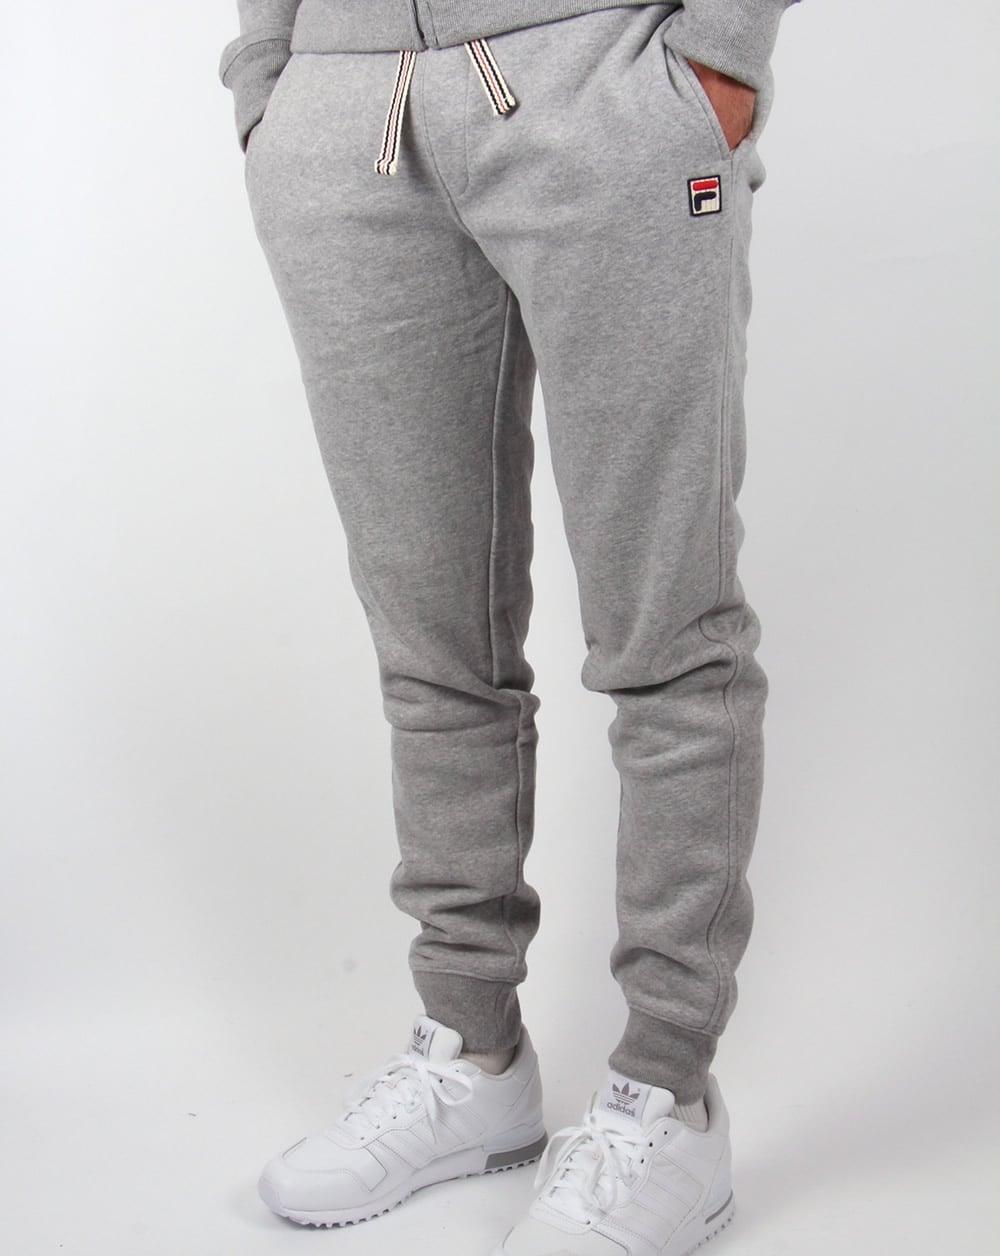 3515b72c5198 Fila Vintage Livata Cuffed Track Pants Grey,bottoms,tracksuit,mens